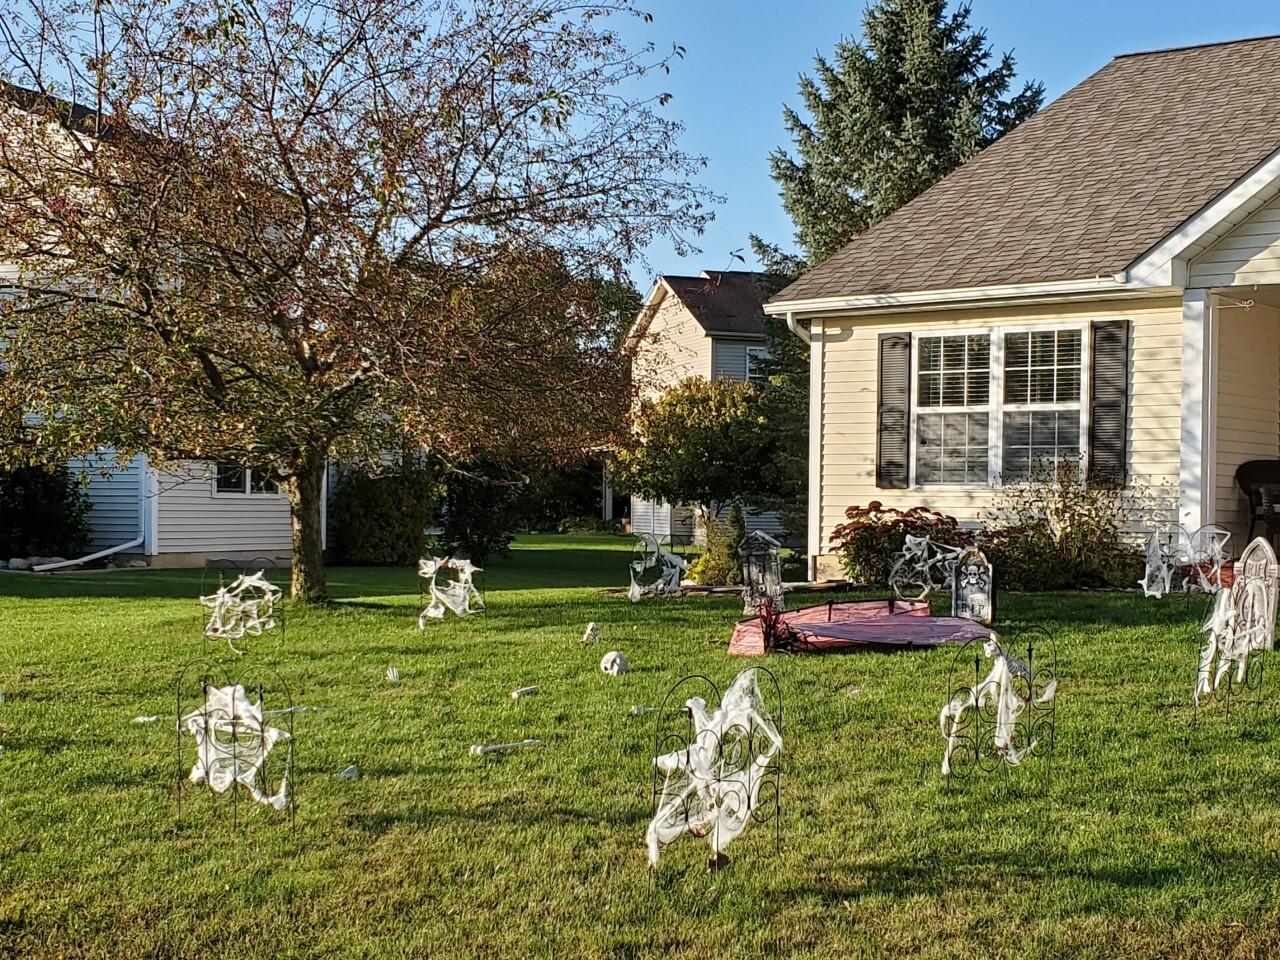 Halloween Decorations6.jpg